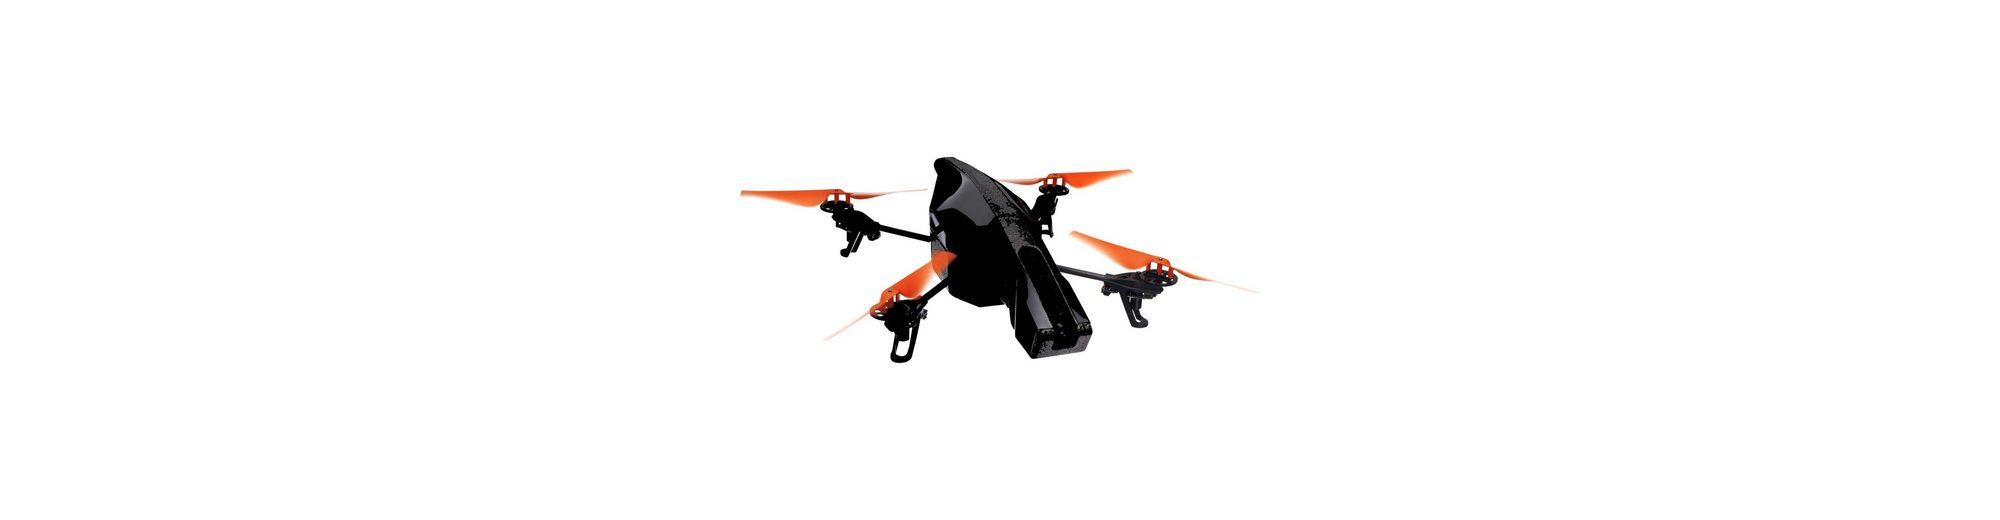 Parrot Drohne »AR.Drone 2.0 Power Edition«